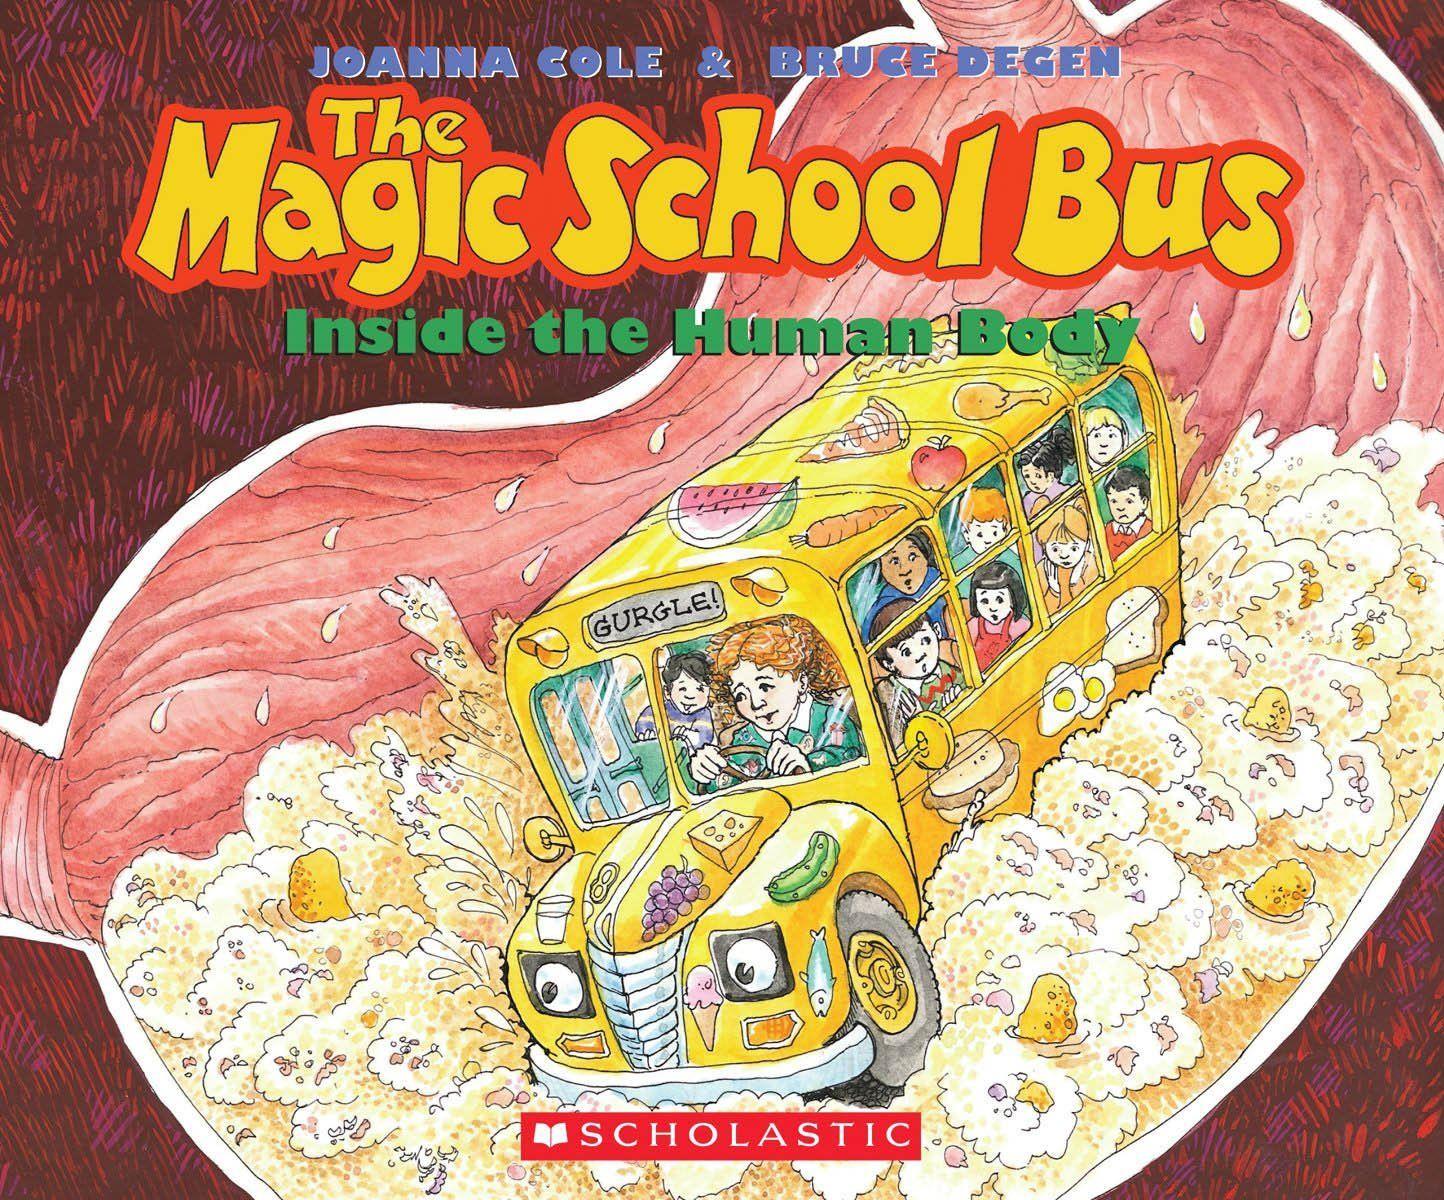 The Magic School Bus Inside The Human Body The Magic